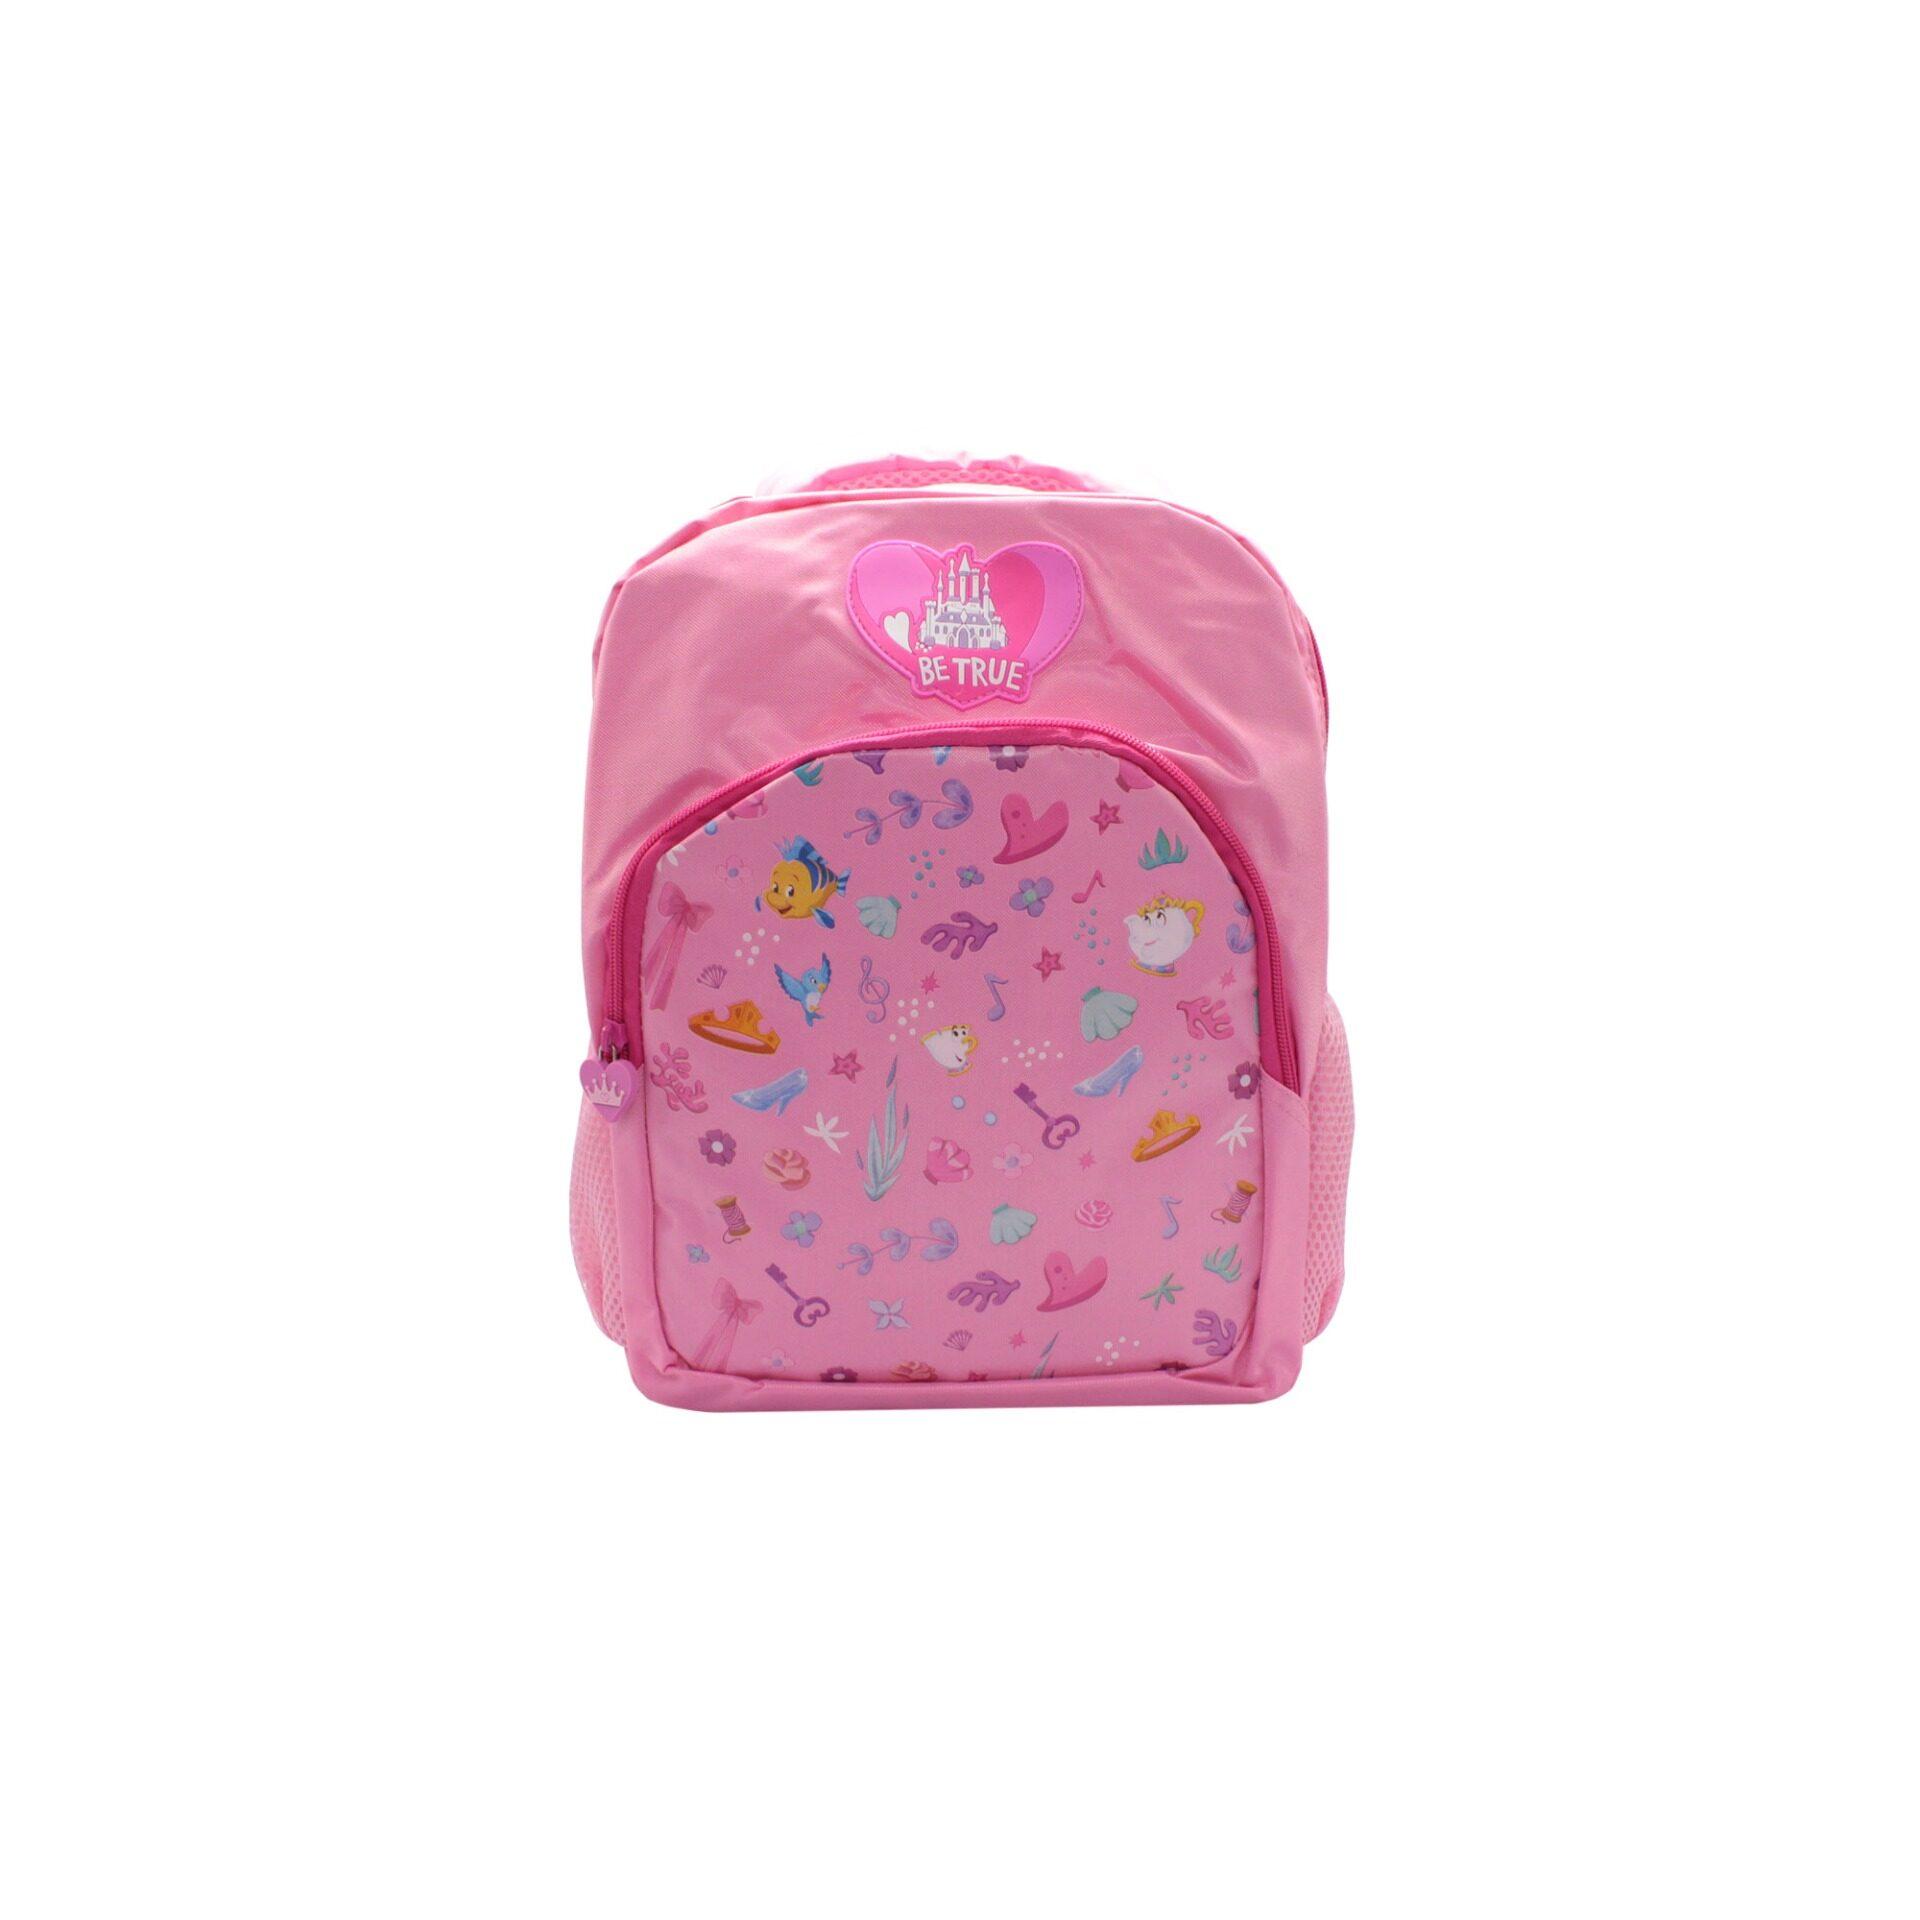 Disney Princess Be True Castle With Front Zipper Pouch Kid\'s Girls Pre School Bag (Pink)